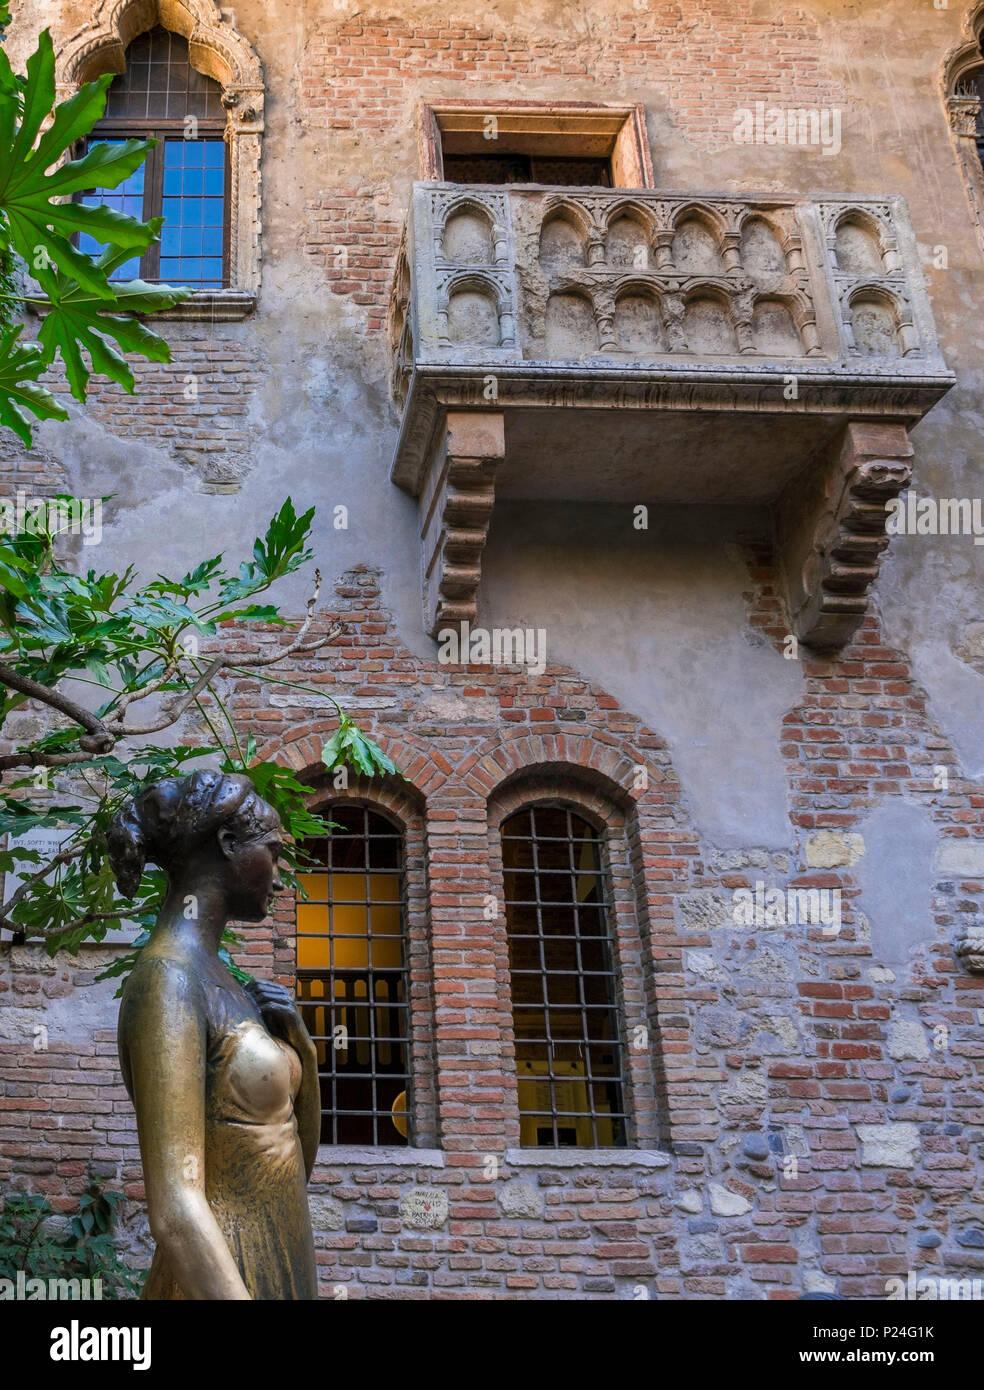 Statue of Julia, Casa di Giulietta or house of Julia, Verona, Veneto, Italy, Europe Stock Photo